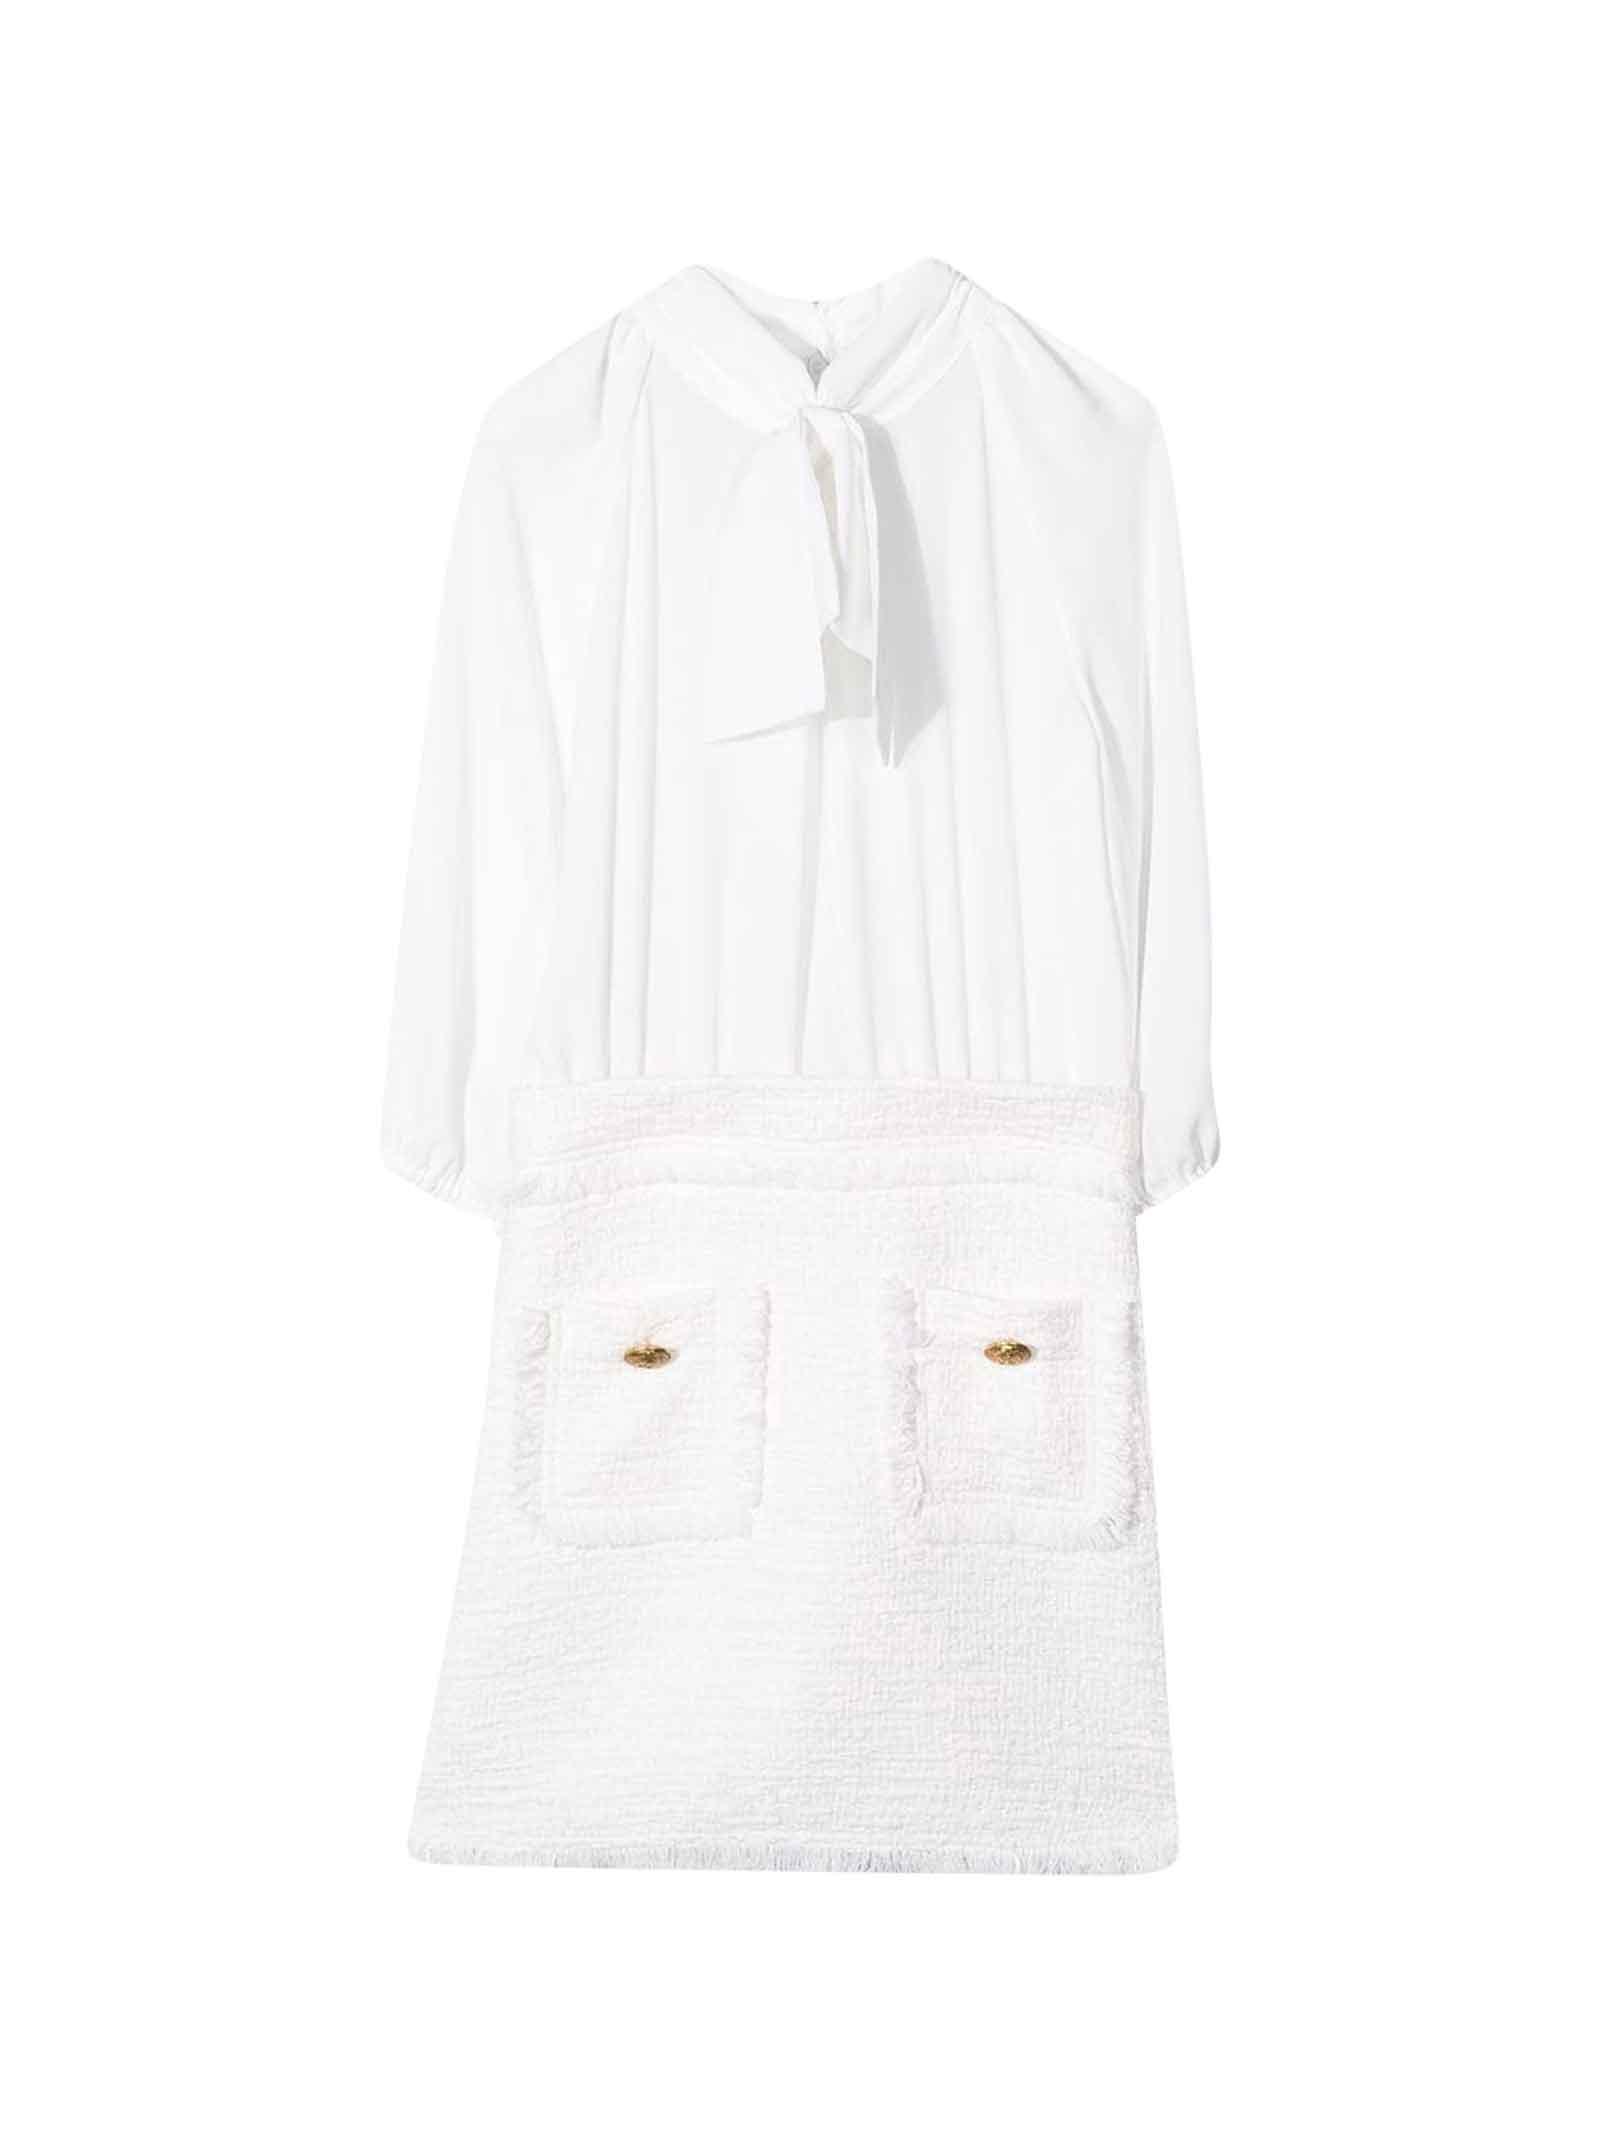 Buy Elisabetta Franchi La Mia Bambina White Dress online, shop Elisabetta Franchi La Mia Bambina with free shipping